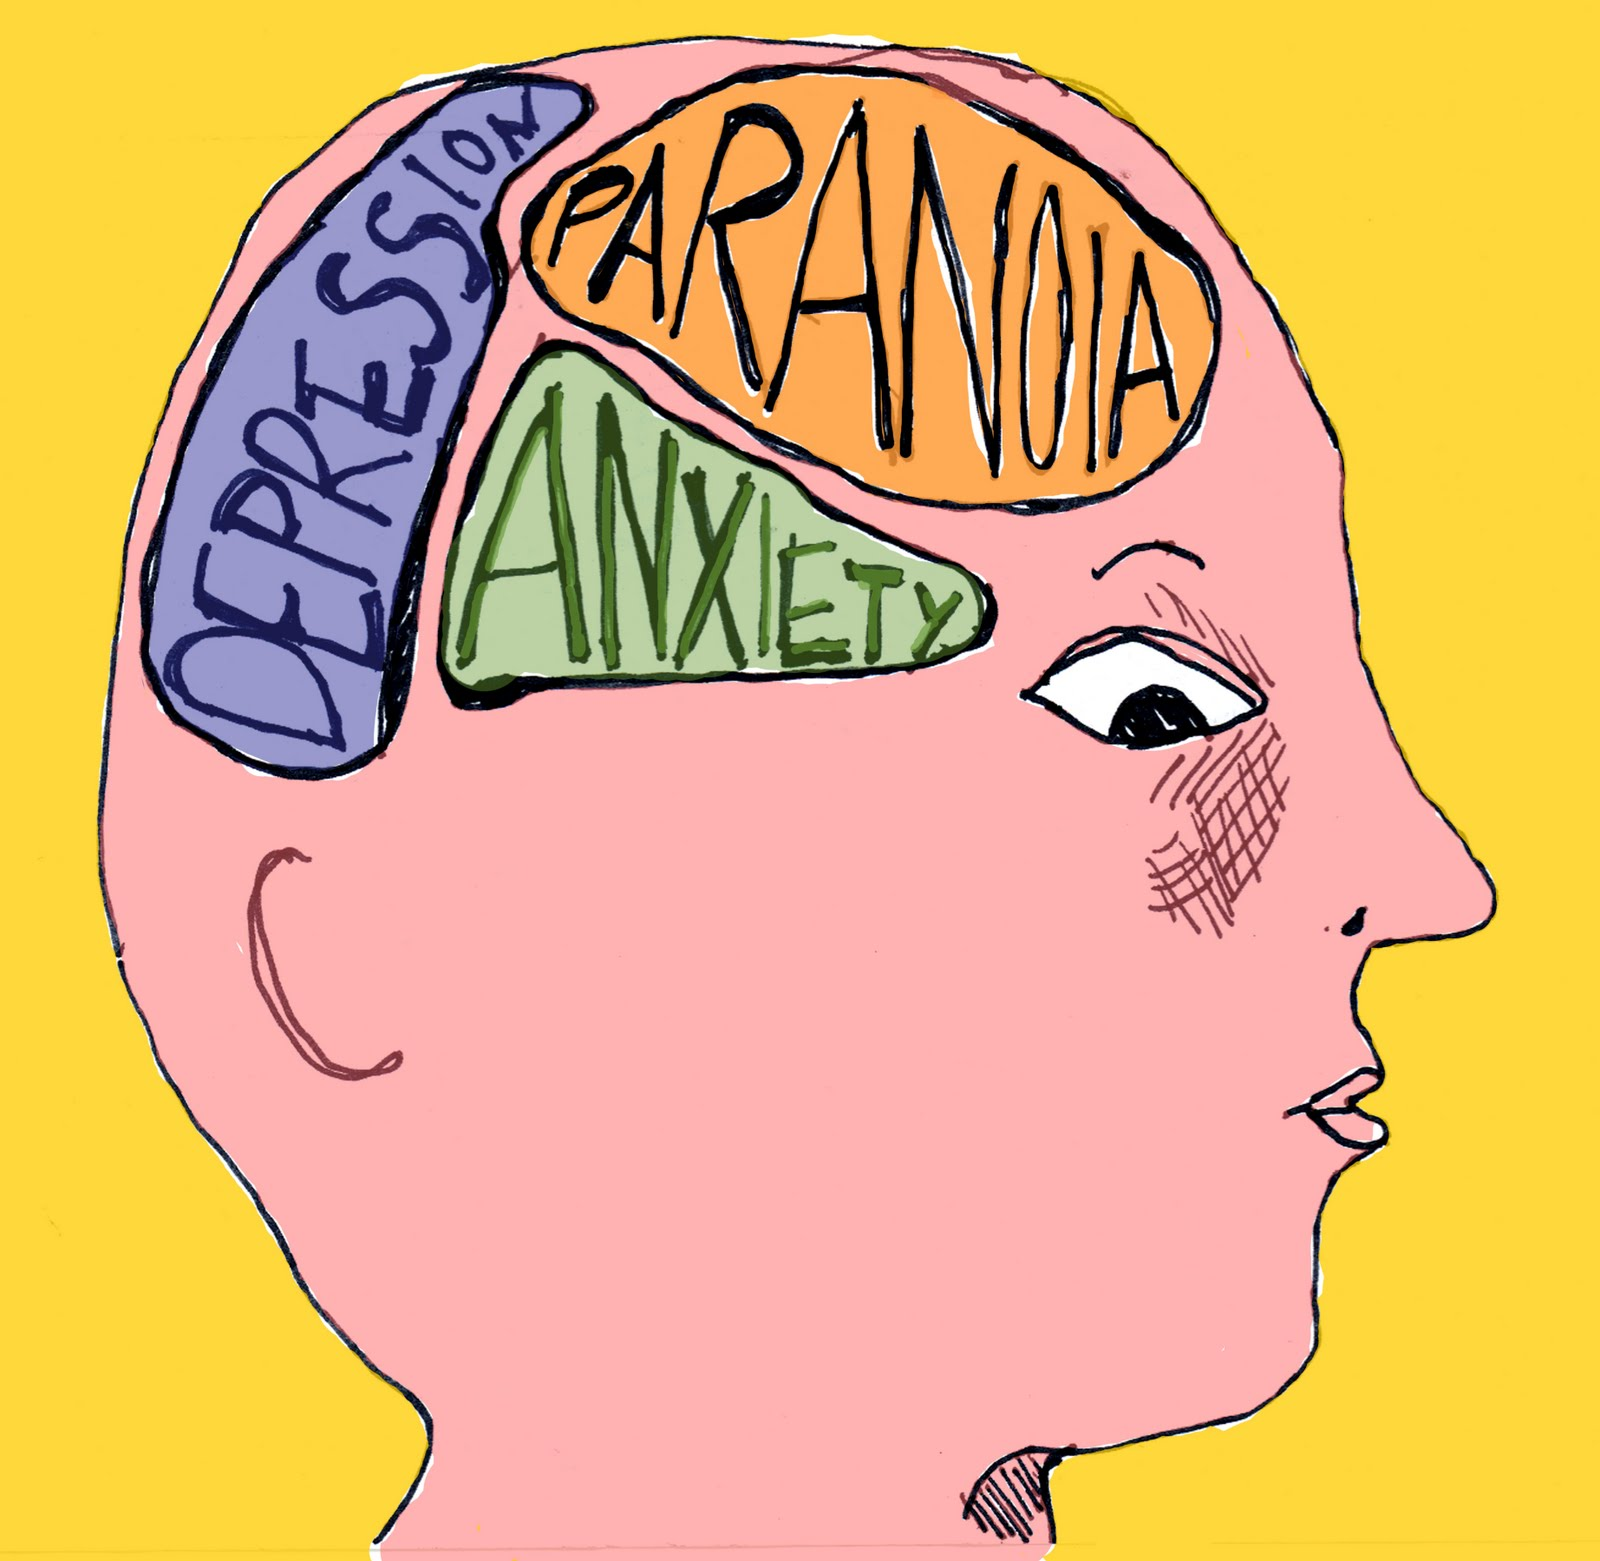 ناهماهنگی شناختی یا Cognitive Dissonance